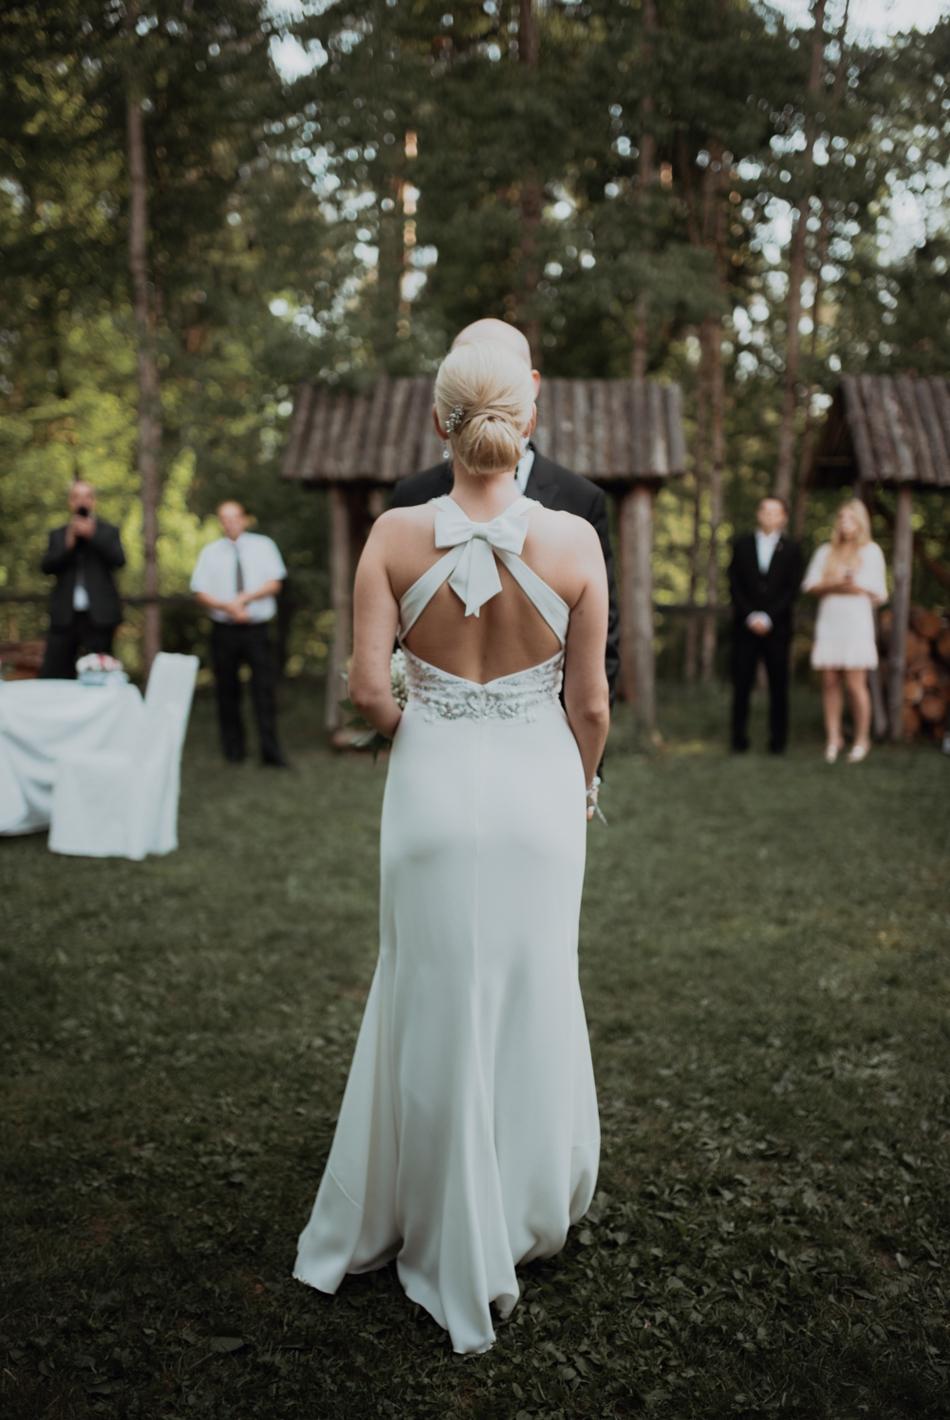 wedding-photographer-zukography-destination66.jpg